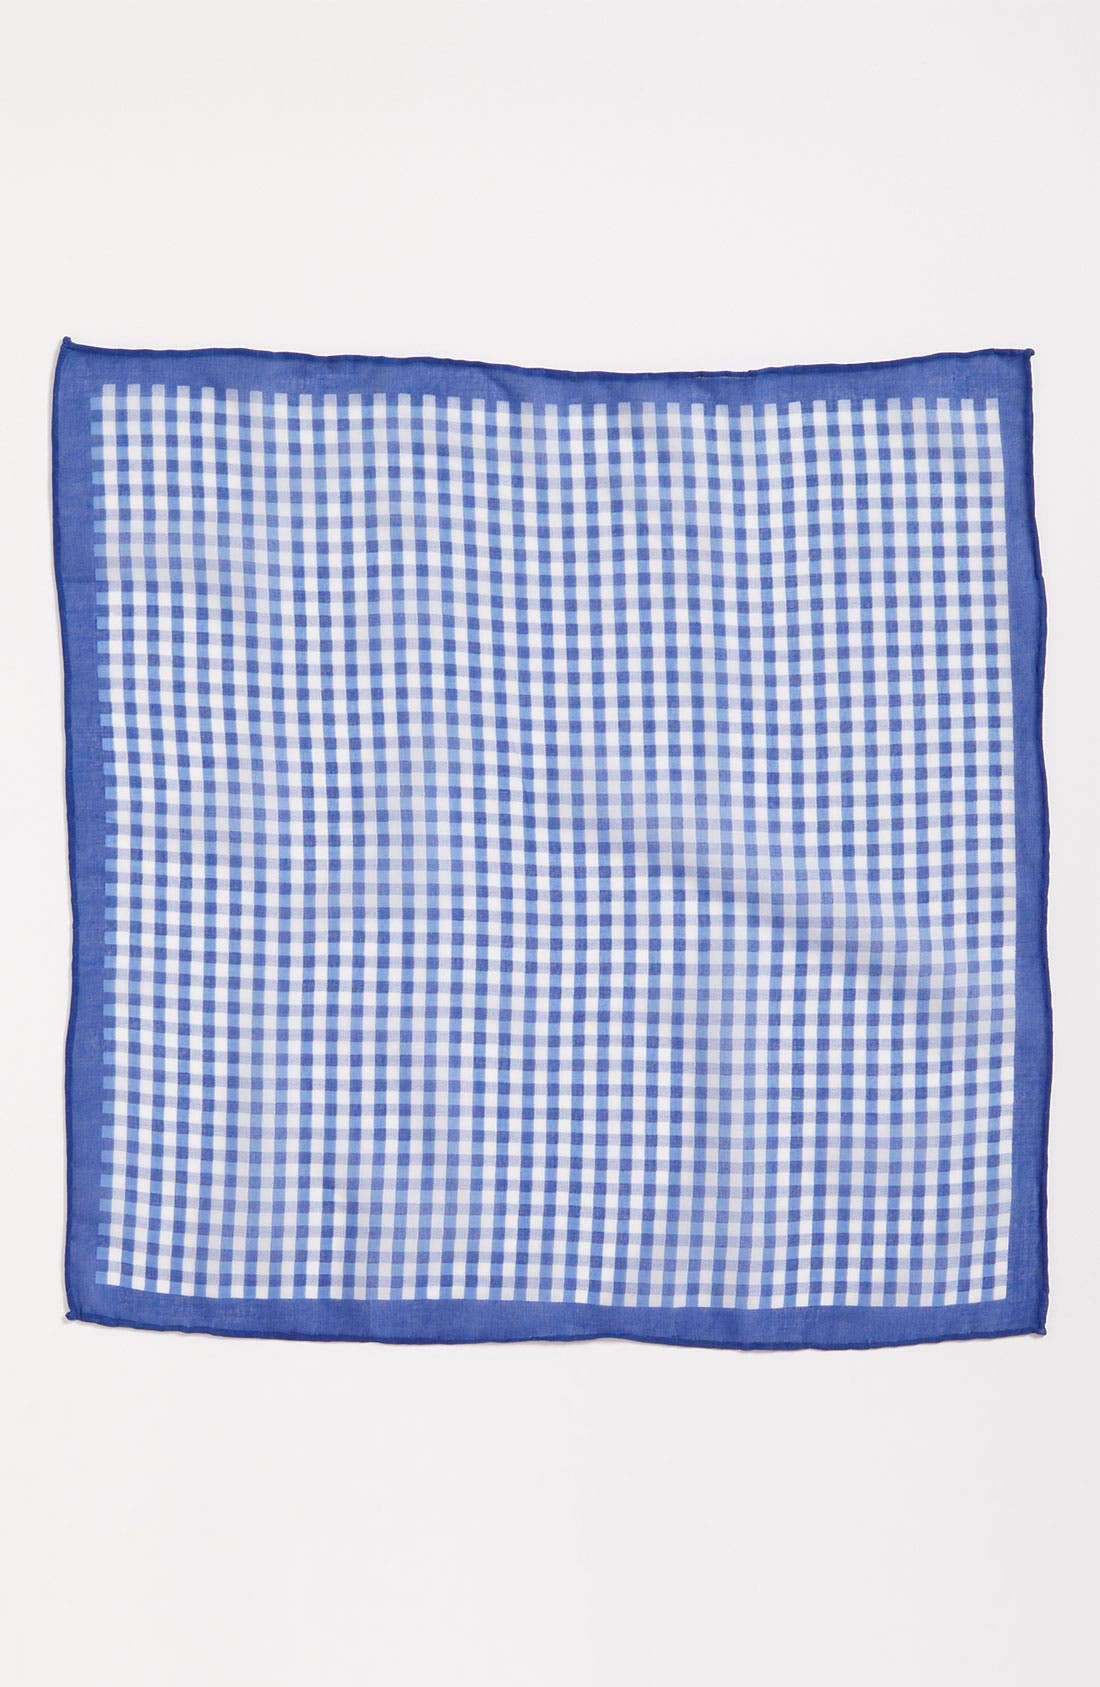 Alternate Image 2  - Calibrate Gingham Pocket Square